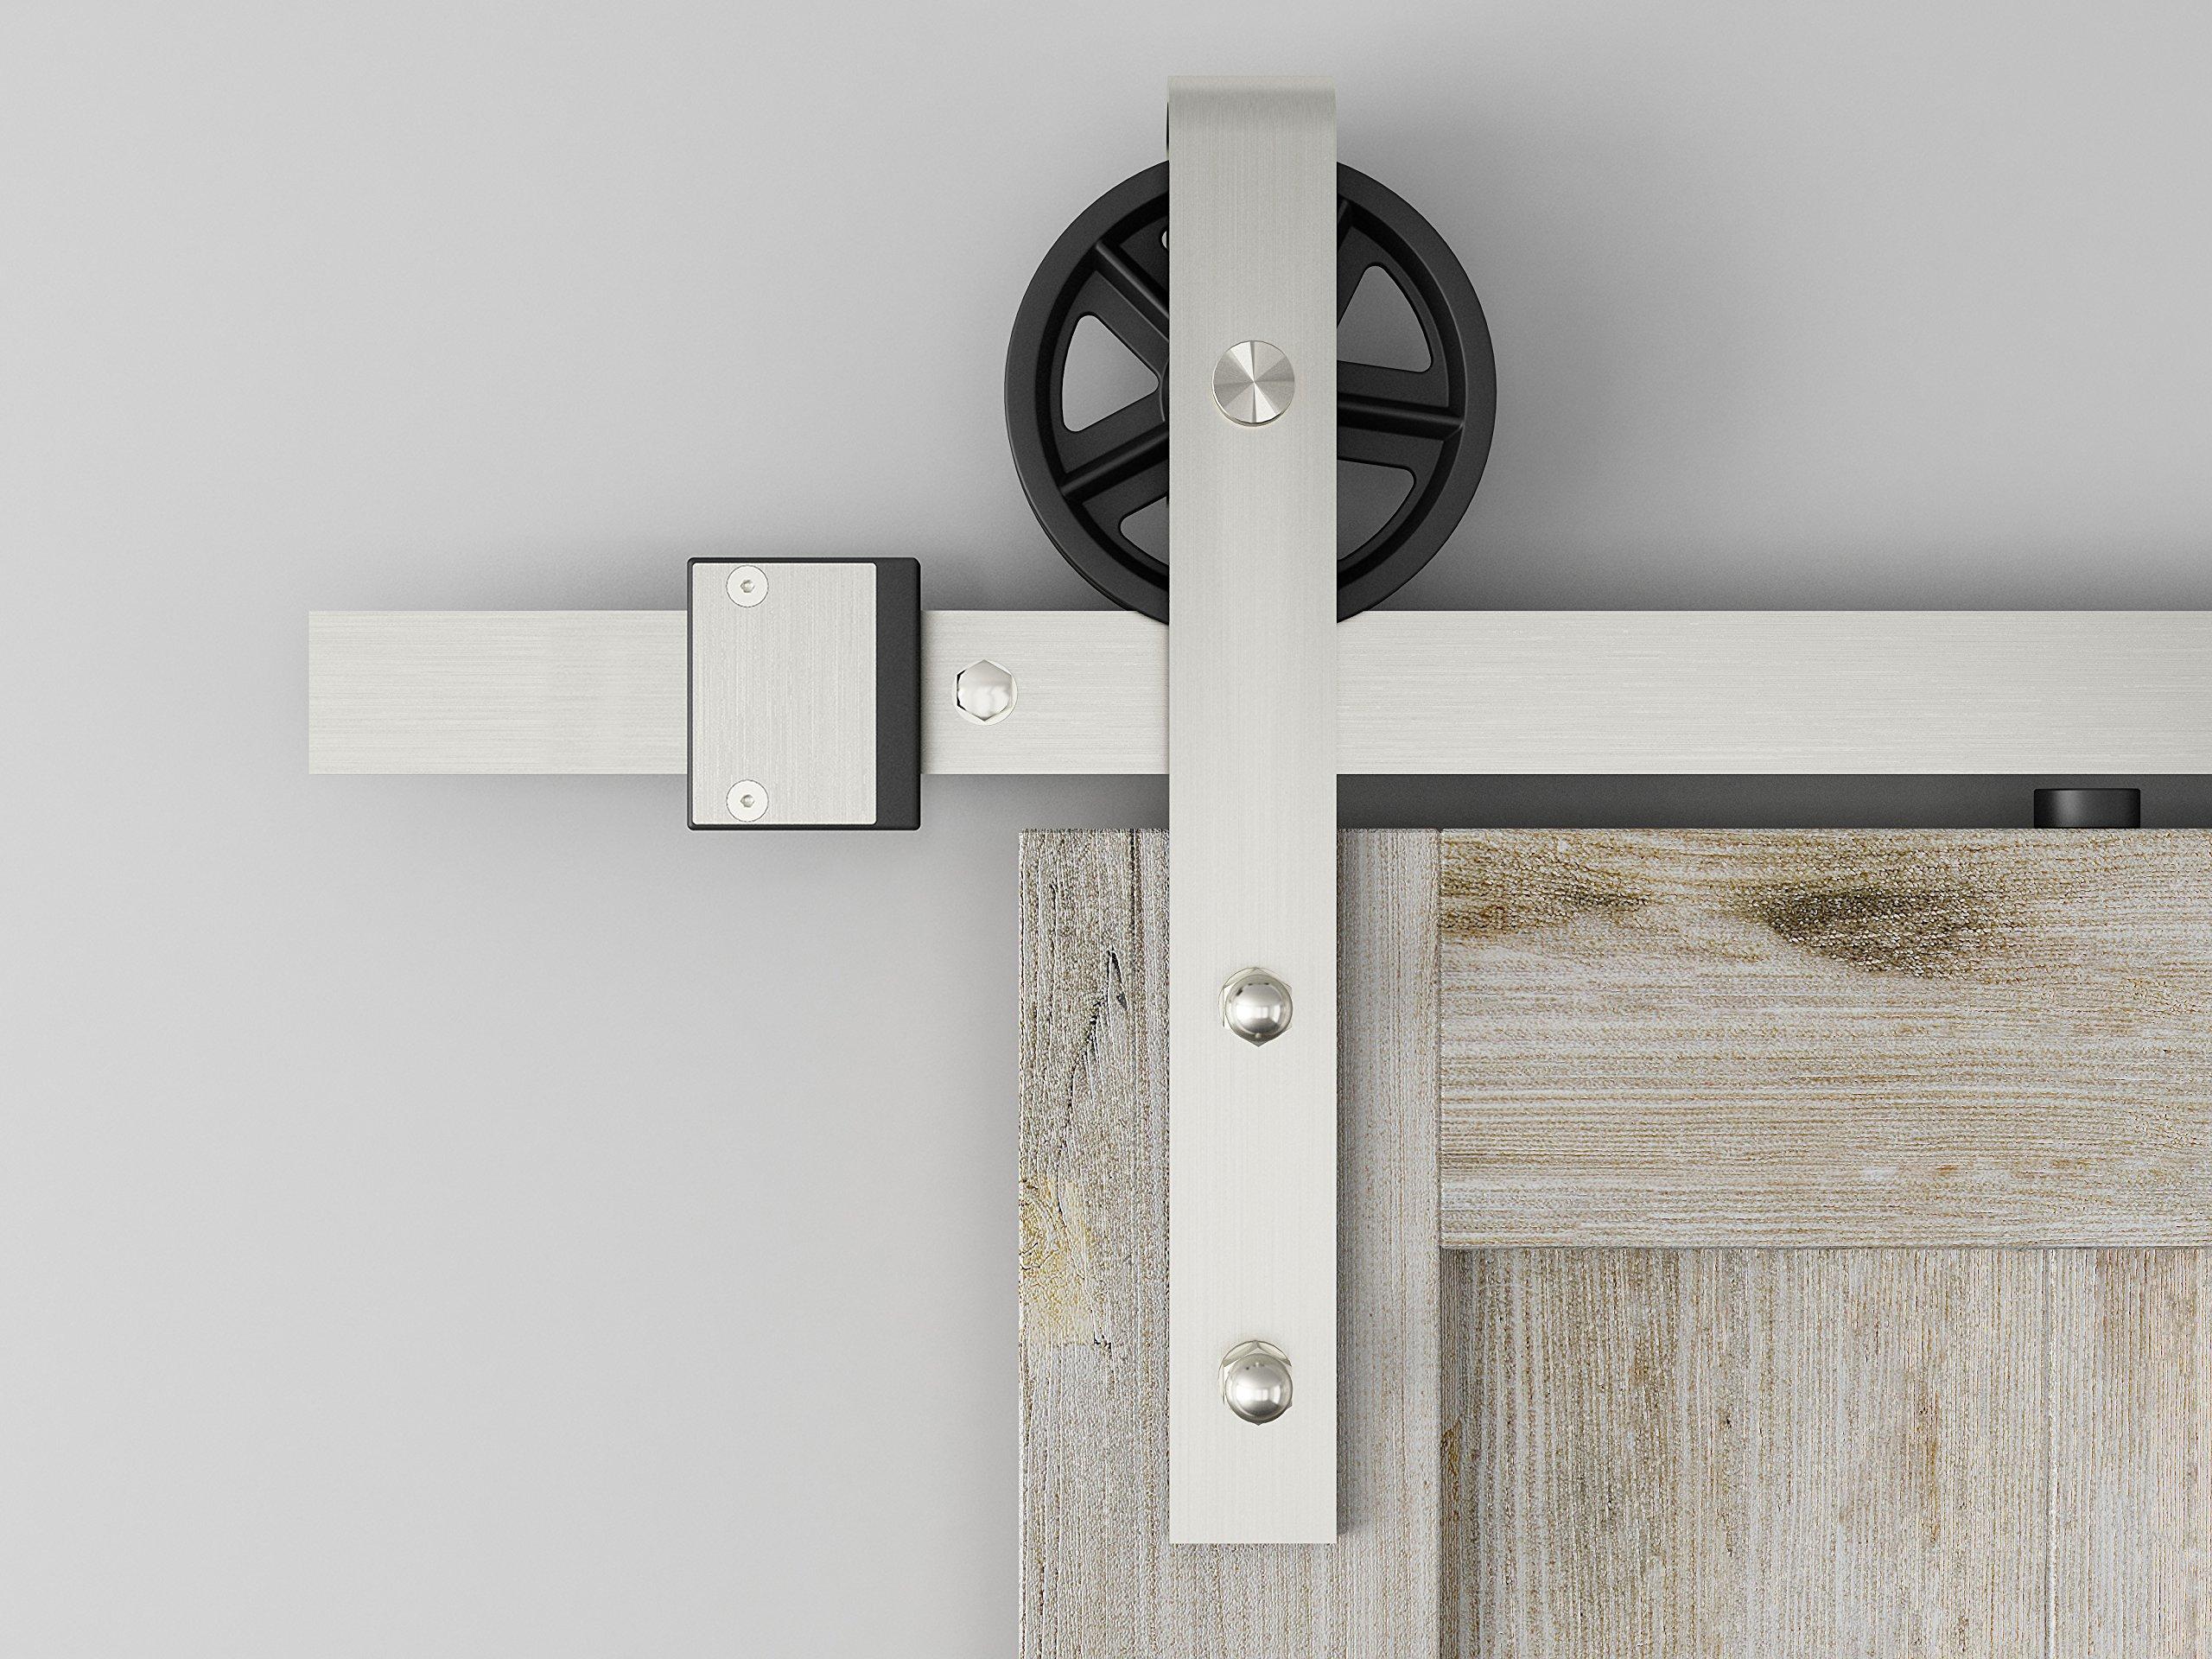 DIYHD 8FT Brushed Nickel Industrial Spoke Wheel Steel Sliding Barn Door Hardware